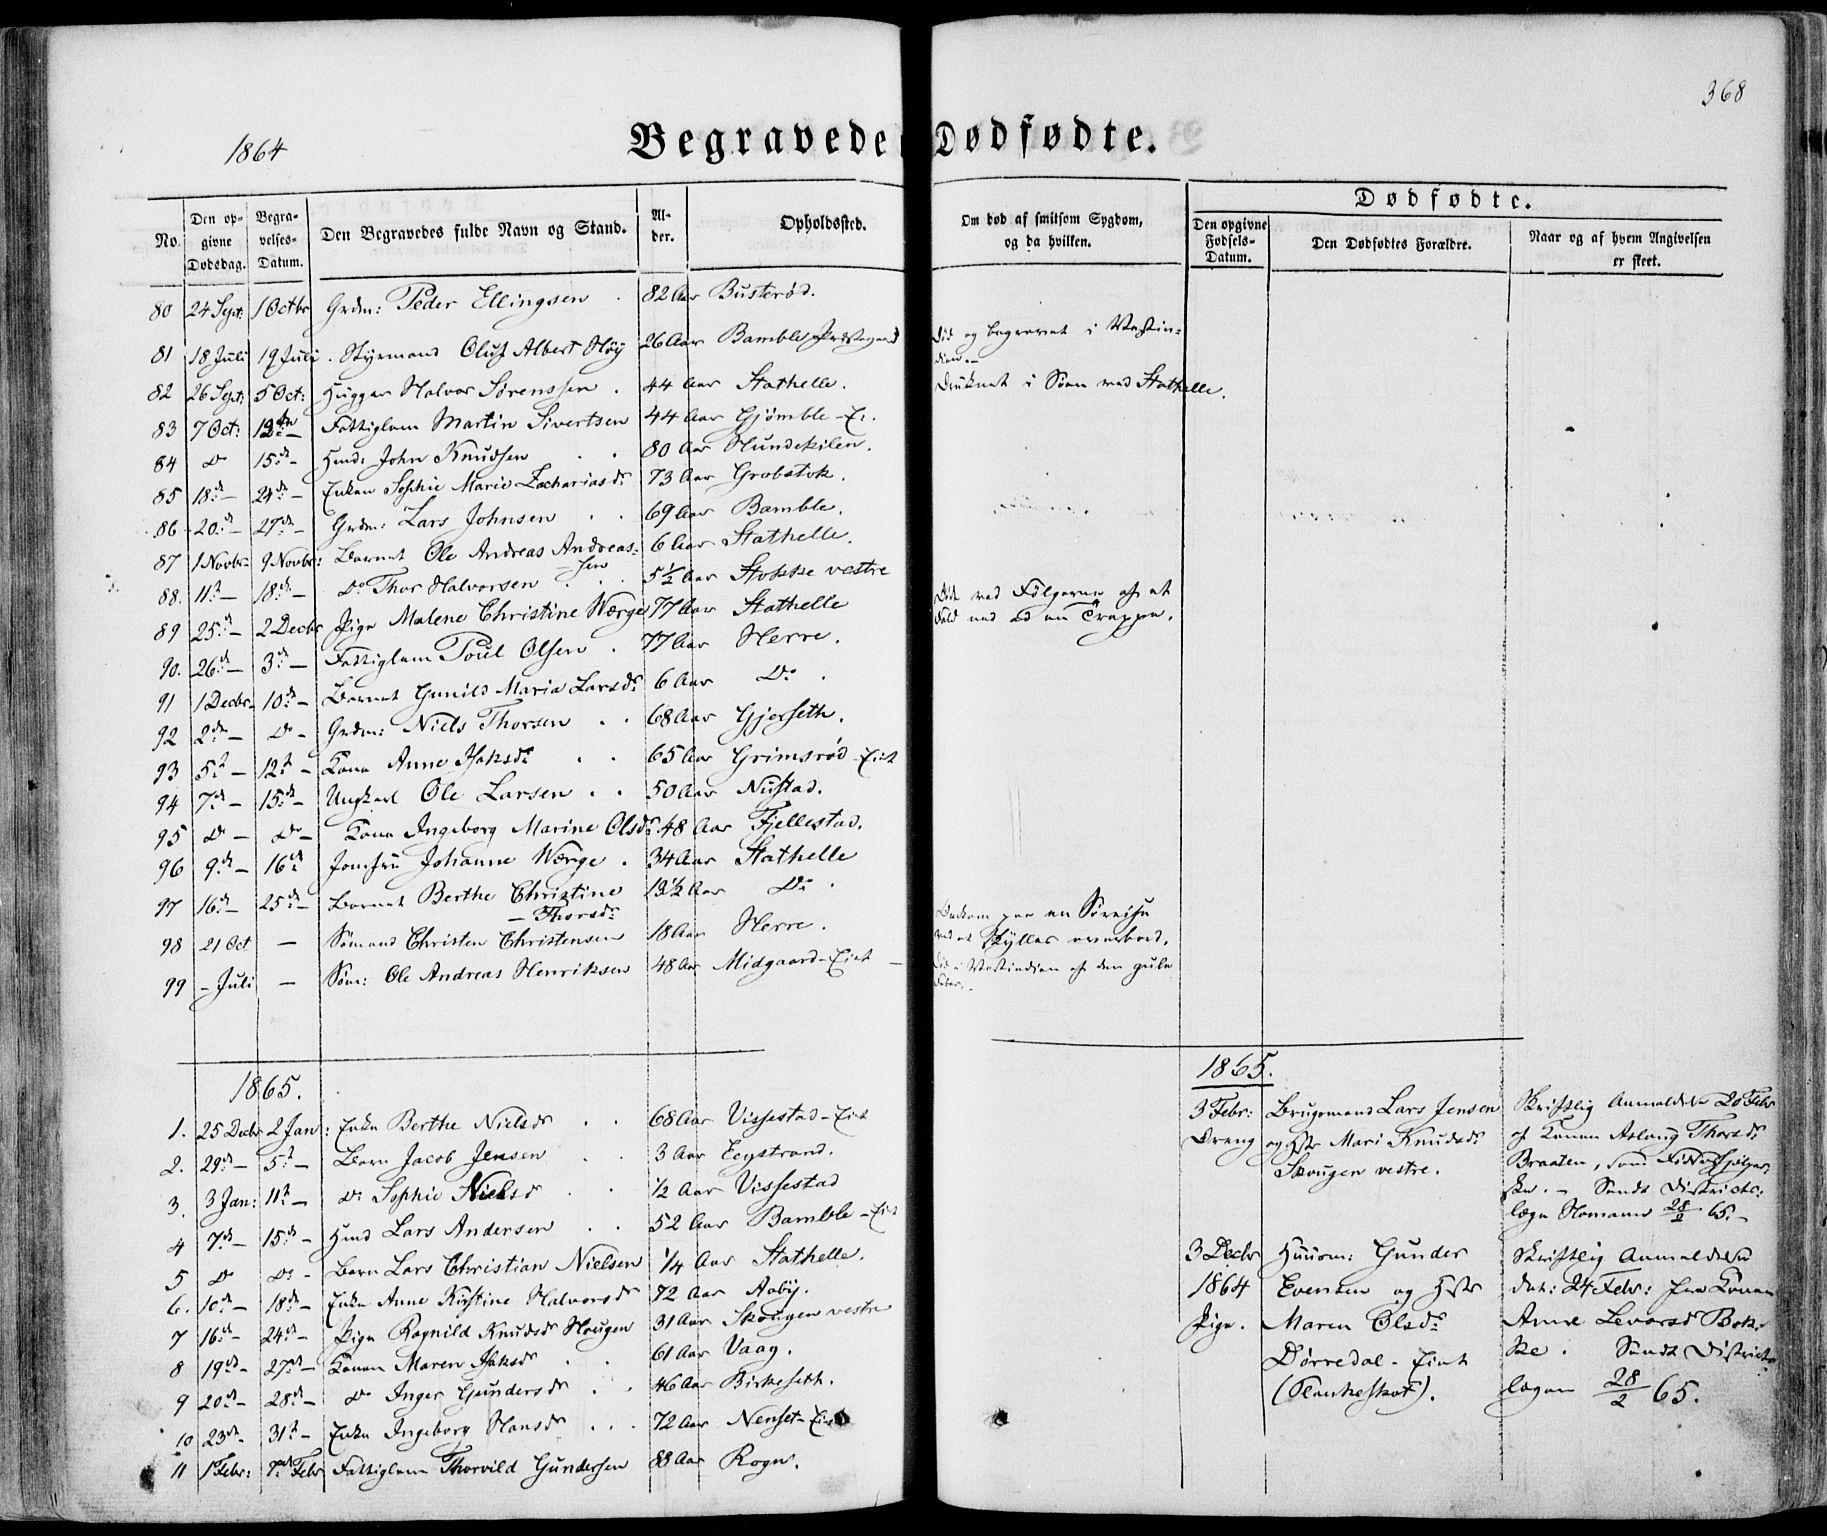 SAKO, Bamble kirkebøker, F/Fa/L0005: Ministerialbok nr. I 5, 1854-1869, s. 368